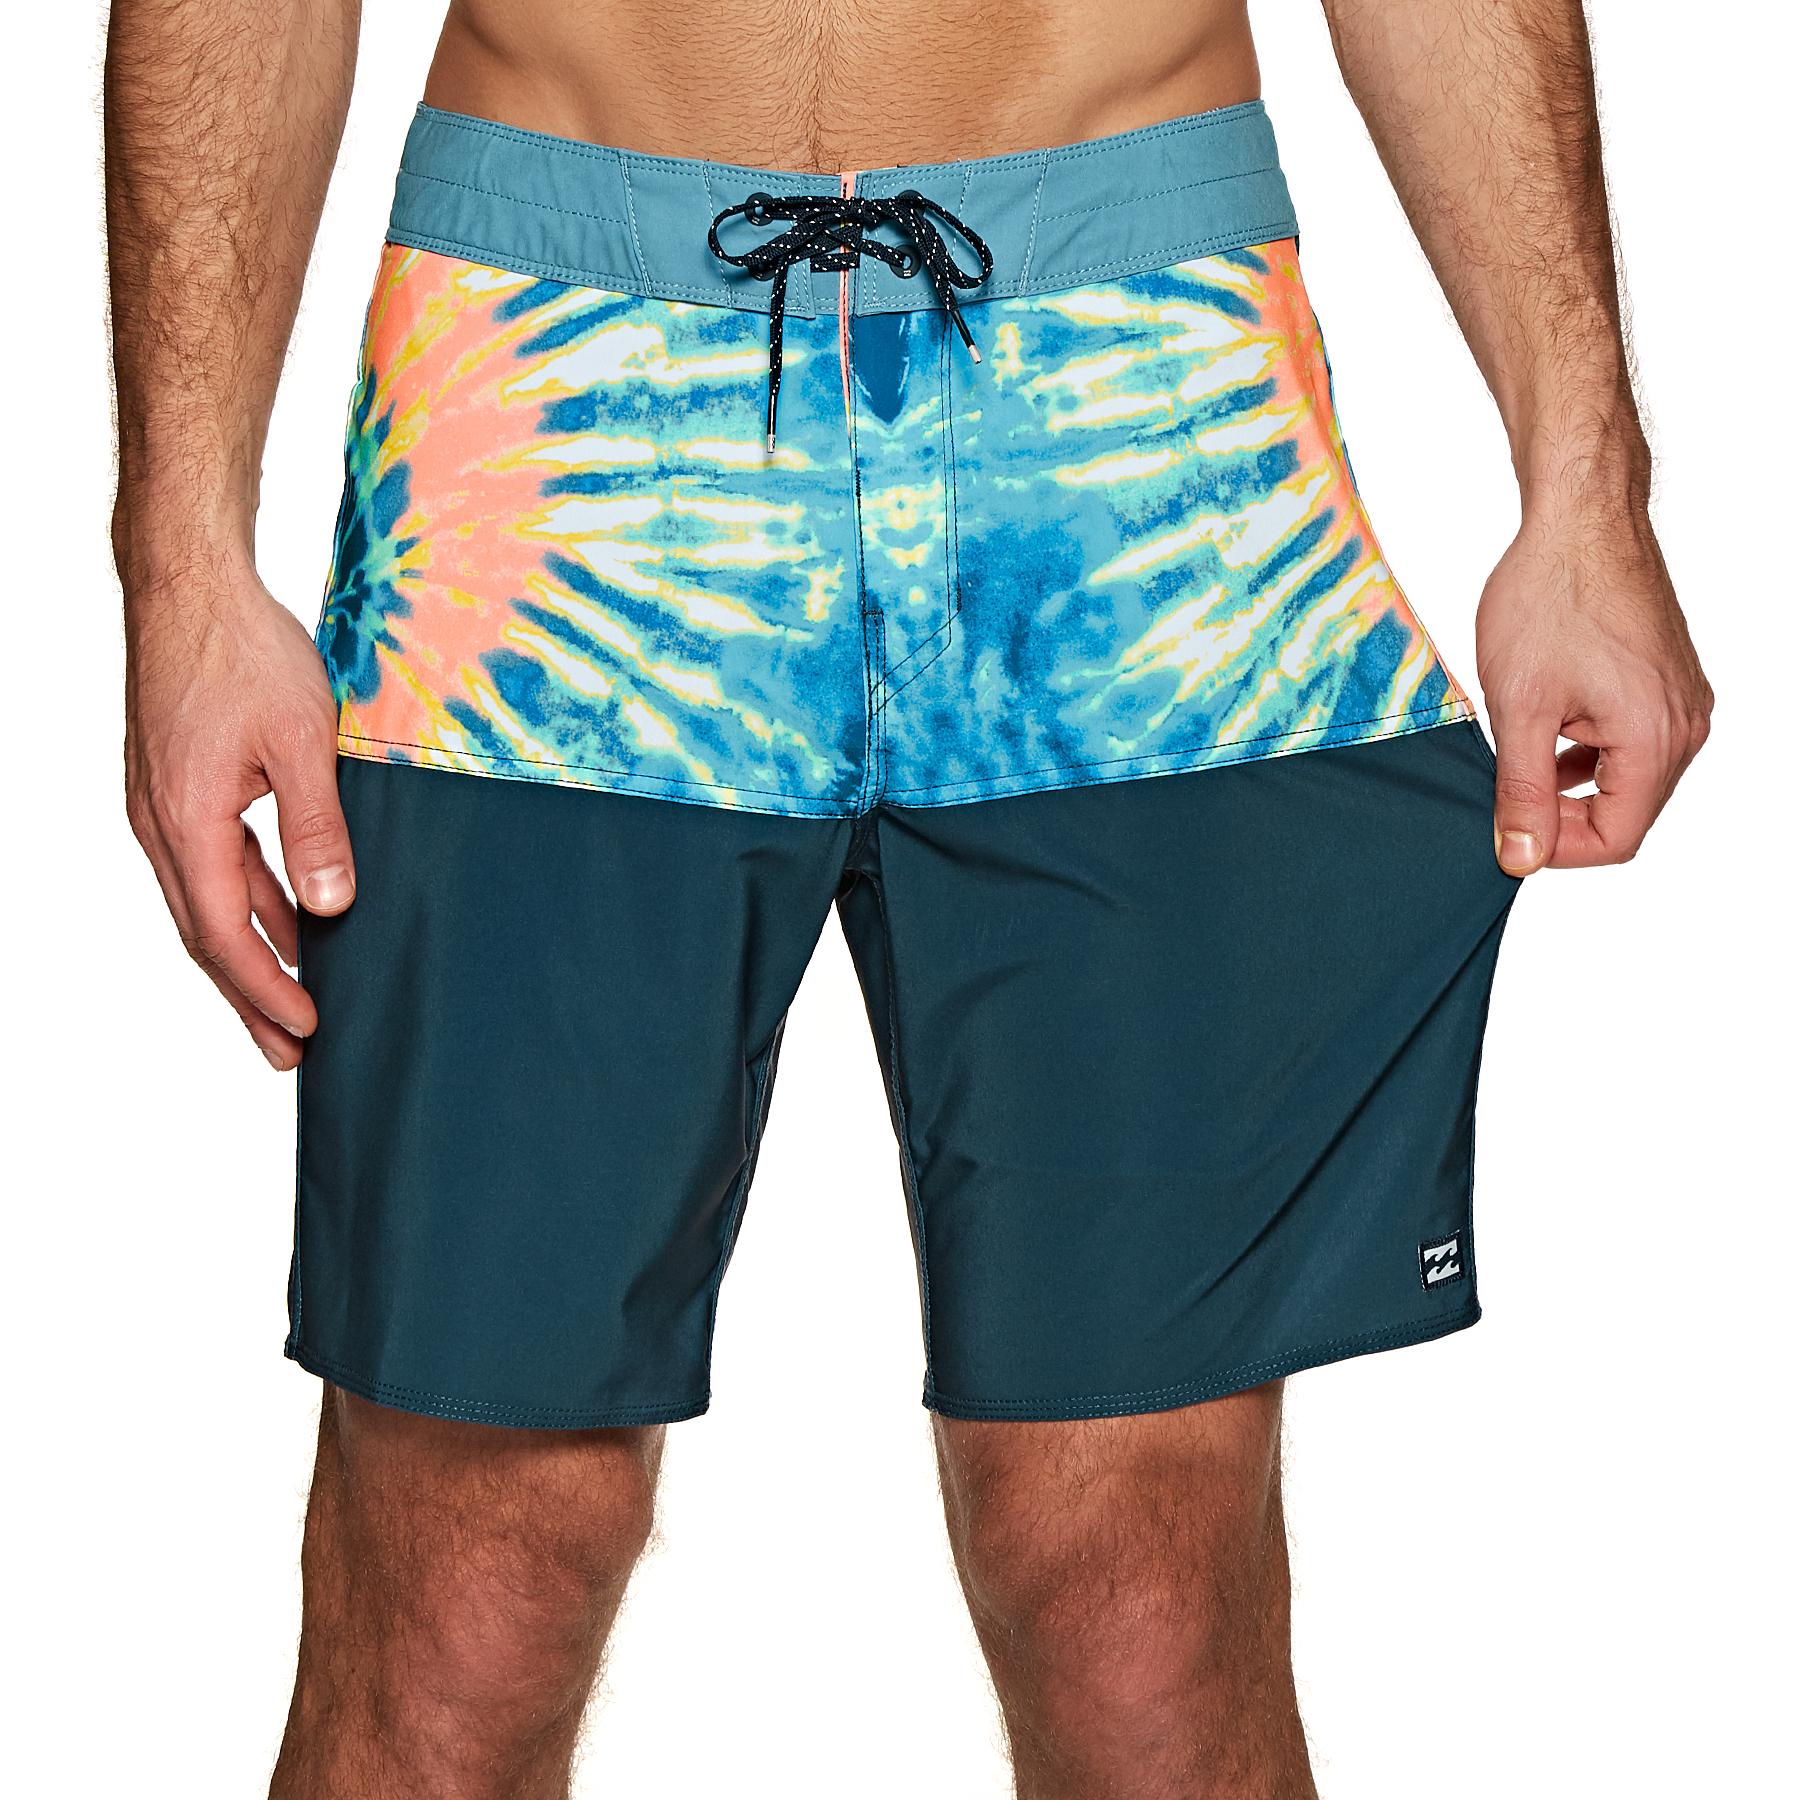 Billabong Boys Resistance Boardshorts Bright Blue